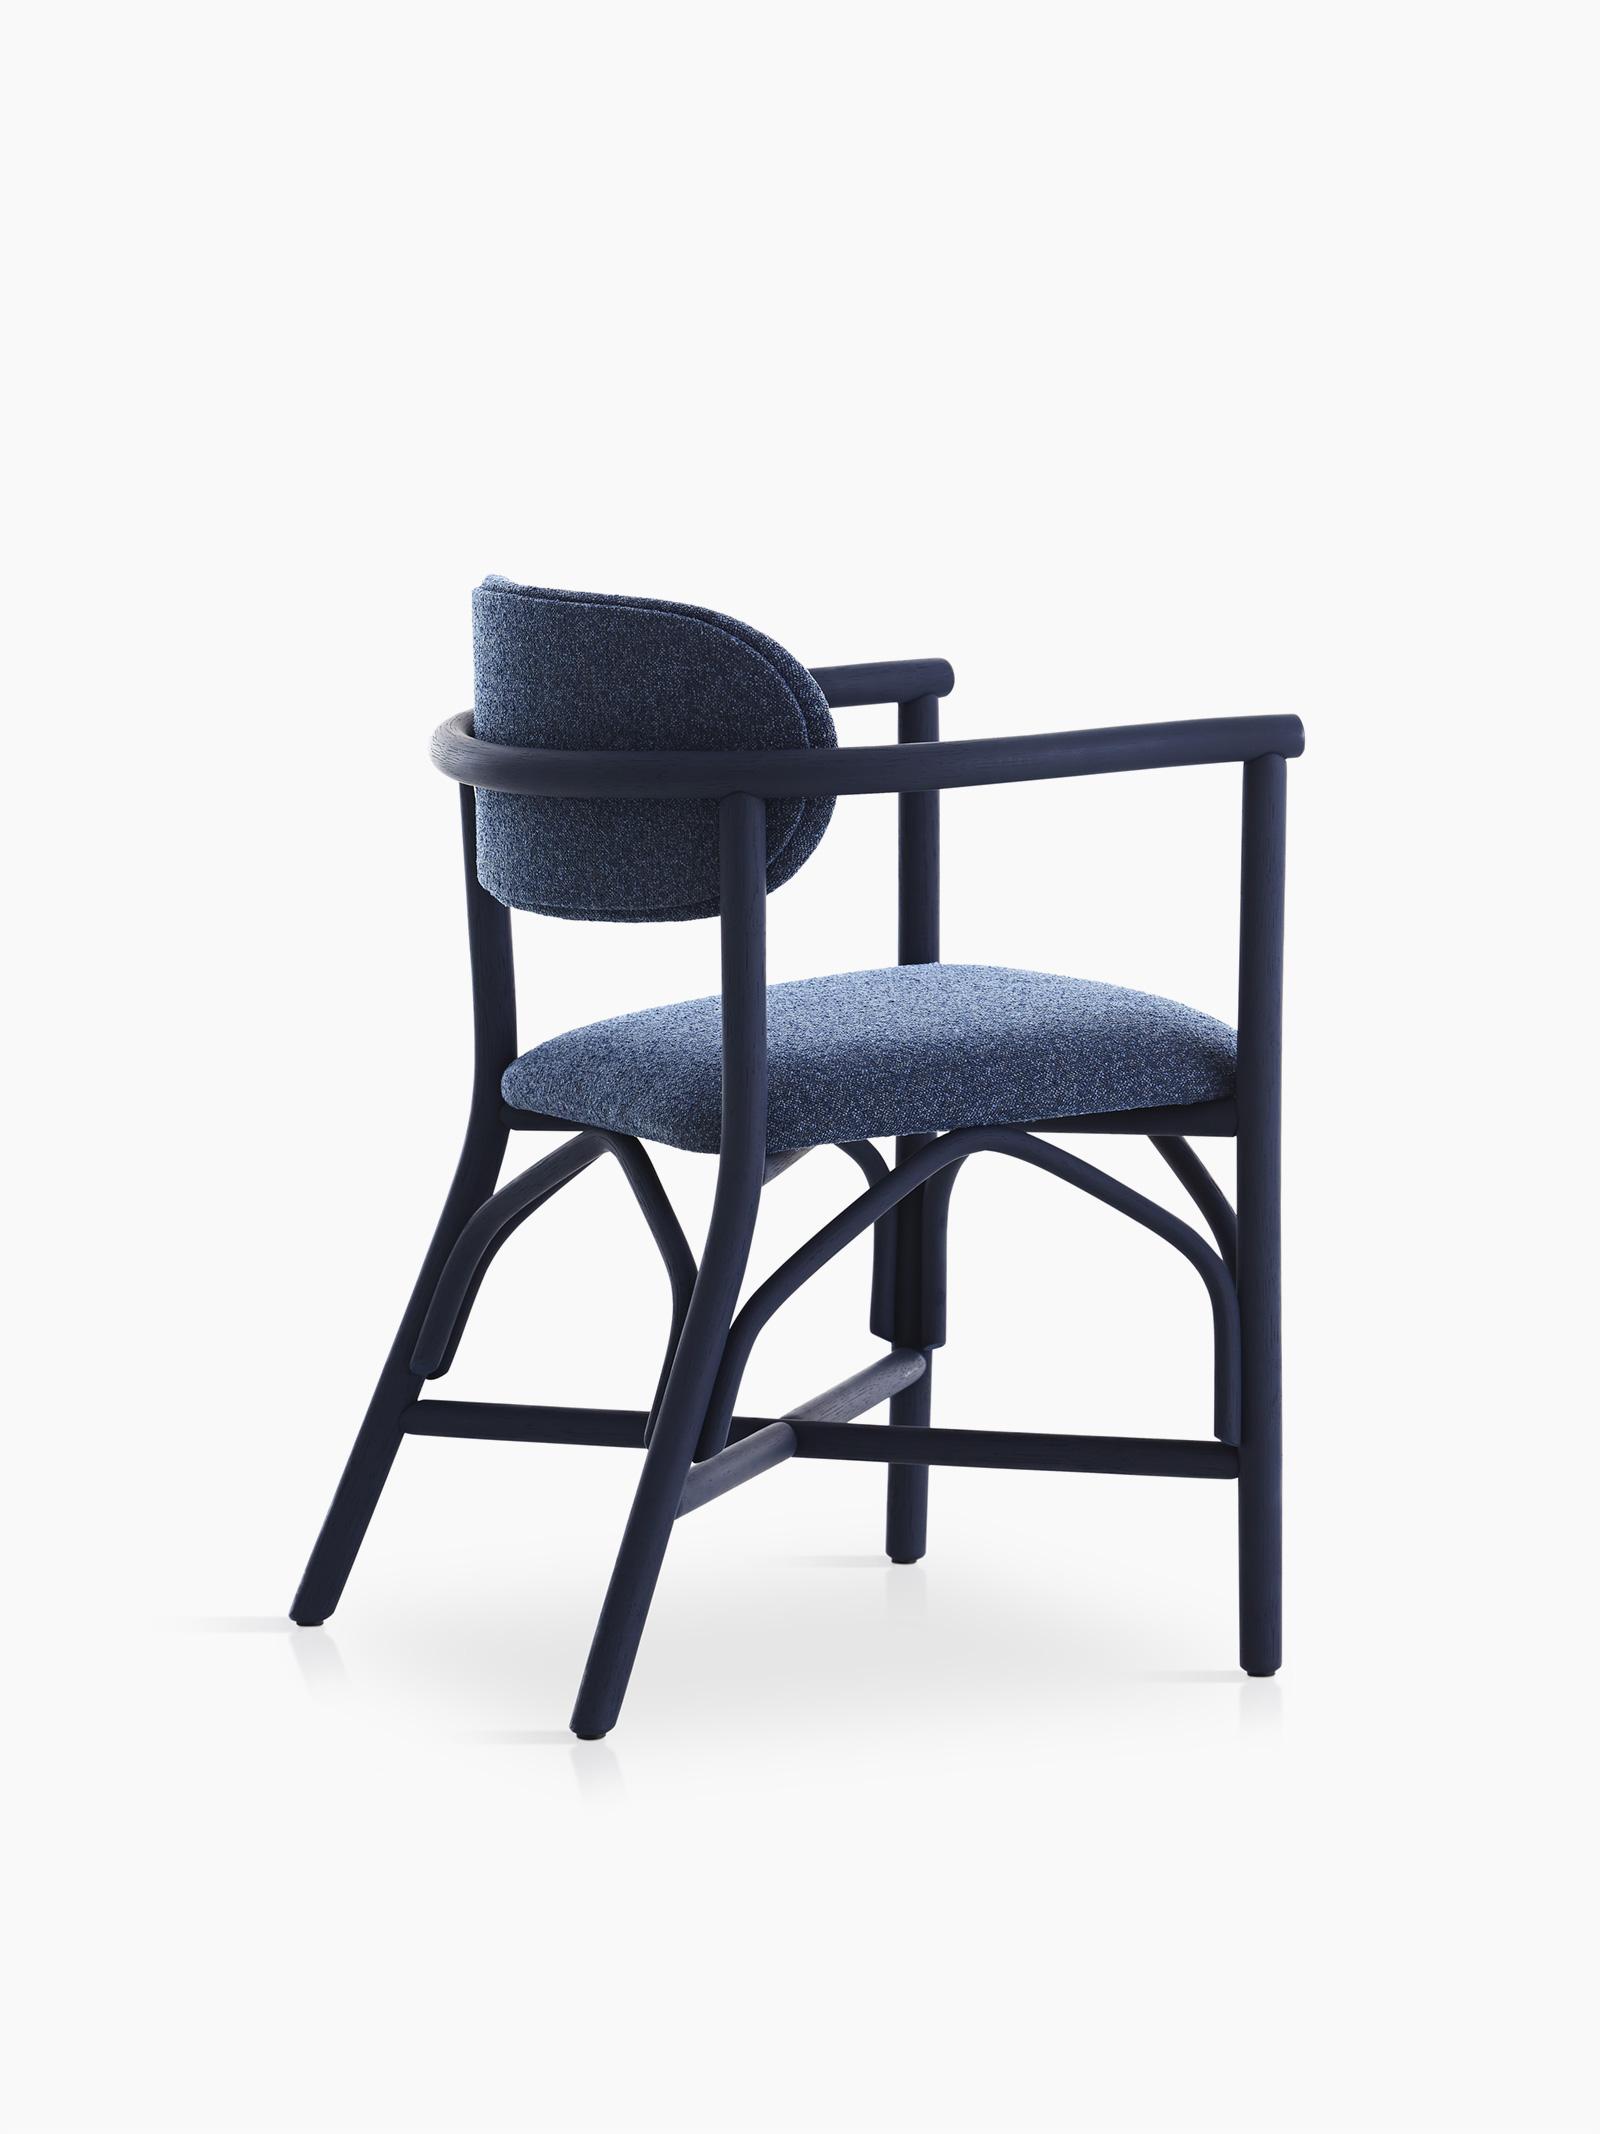 TinnappleMetz-Expormim-Altet-Upholstered-Dining-Armchair-05